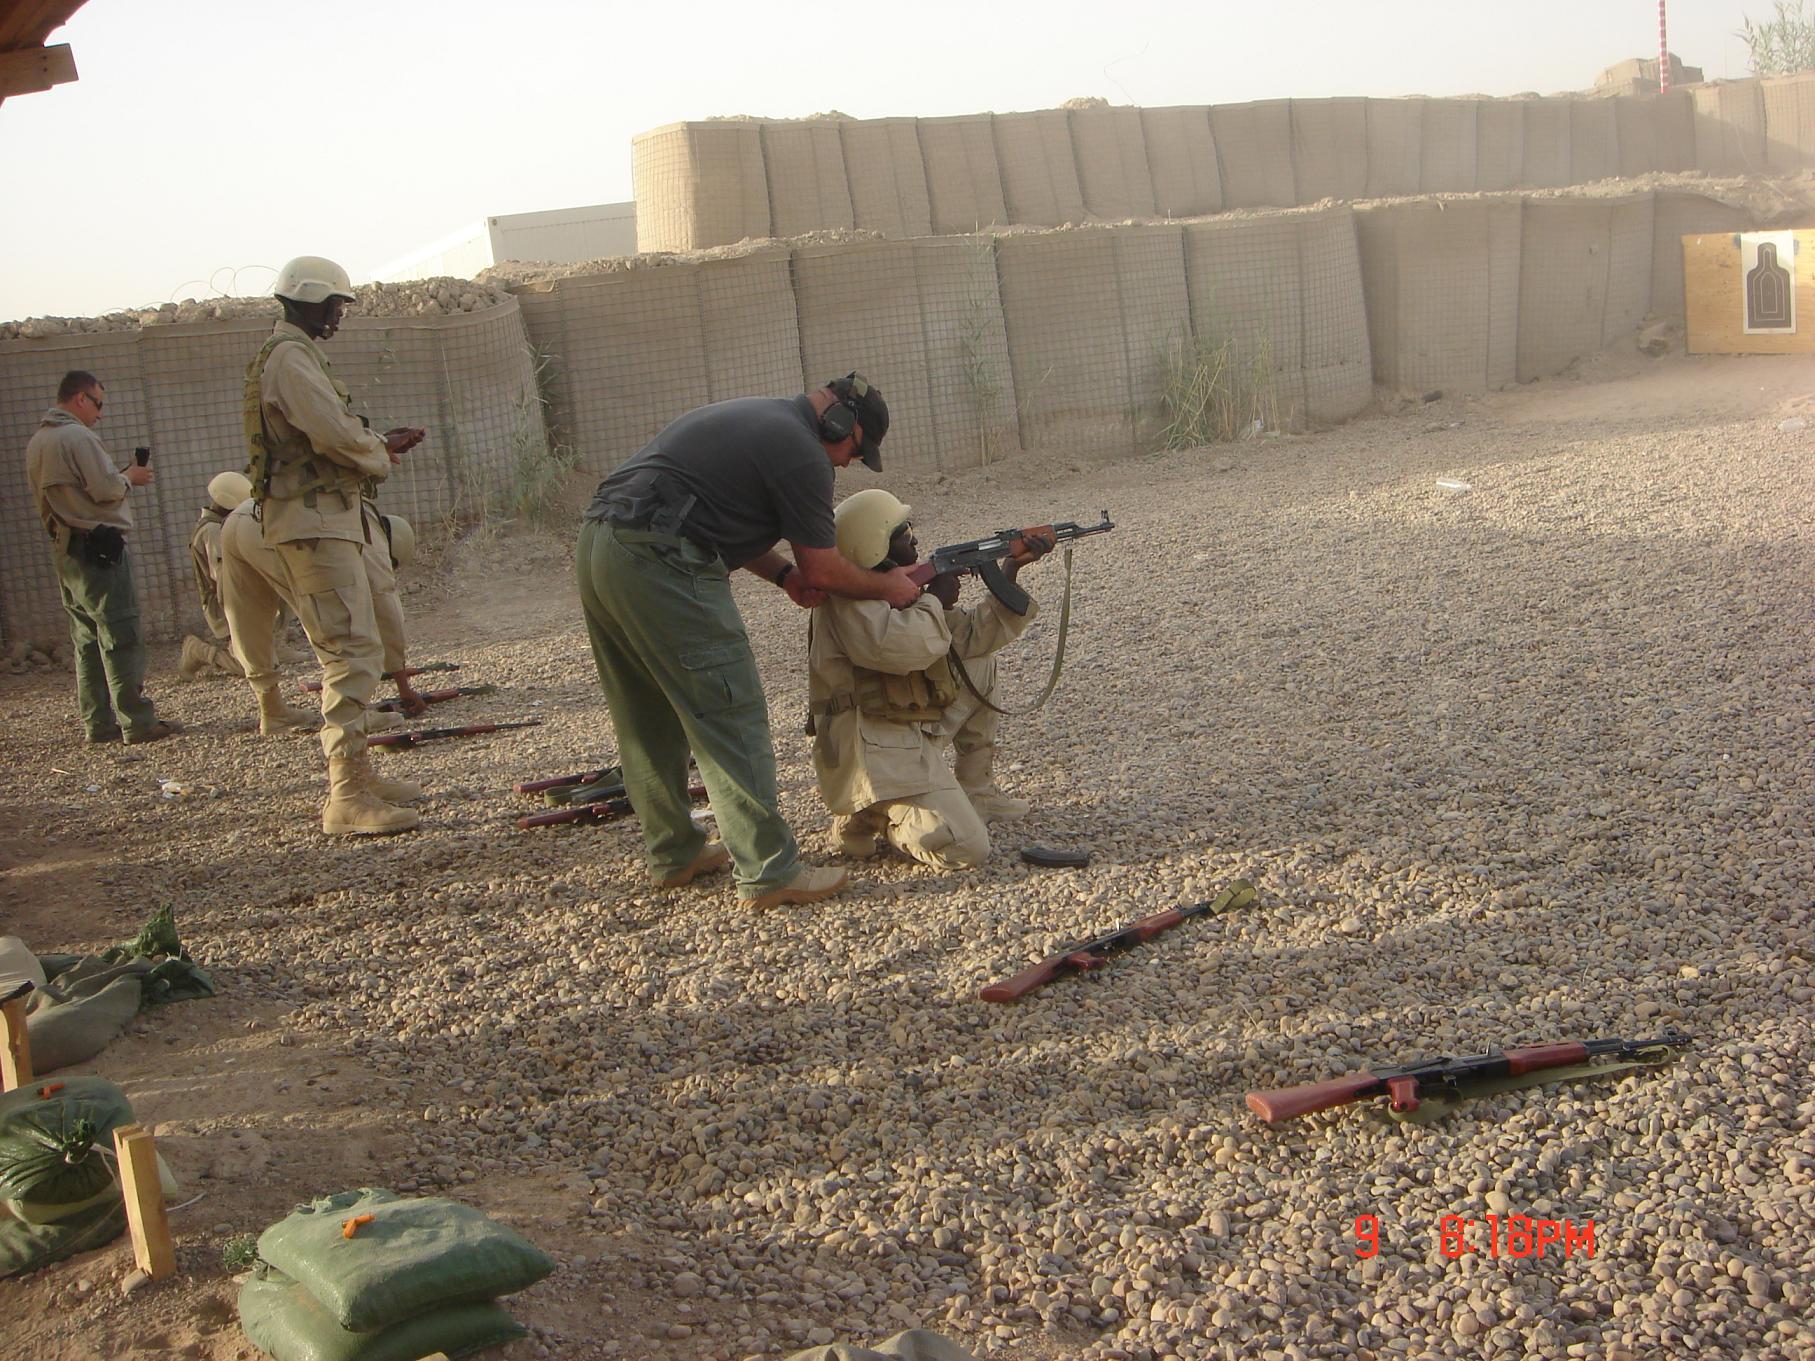 Oleg,John and Ugandans on thwe range.Kneel position